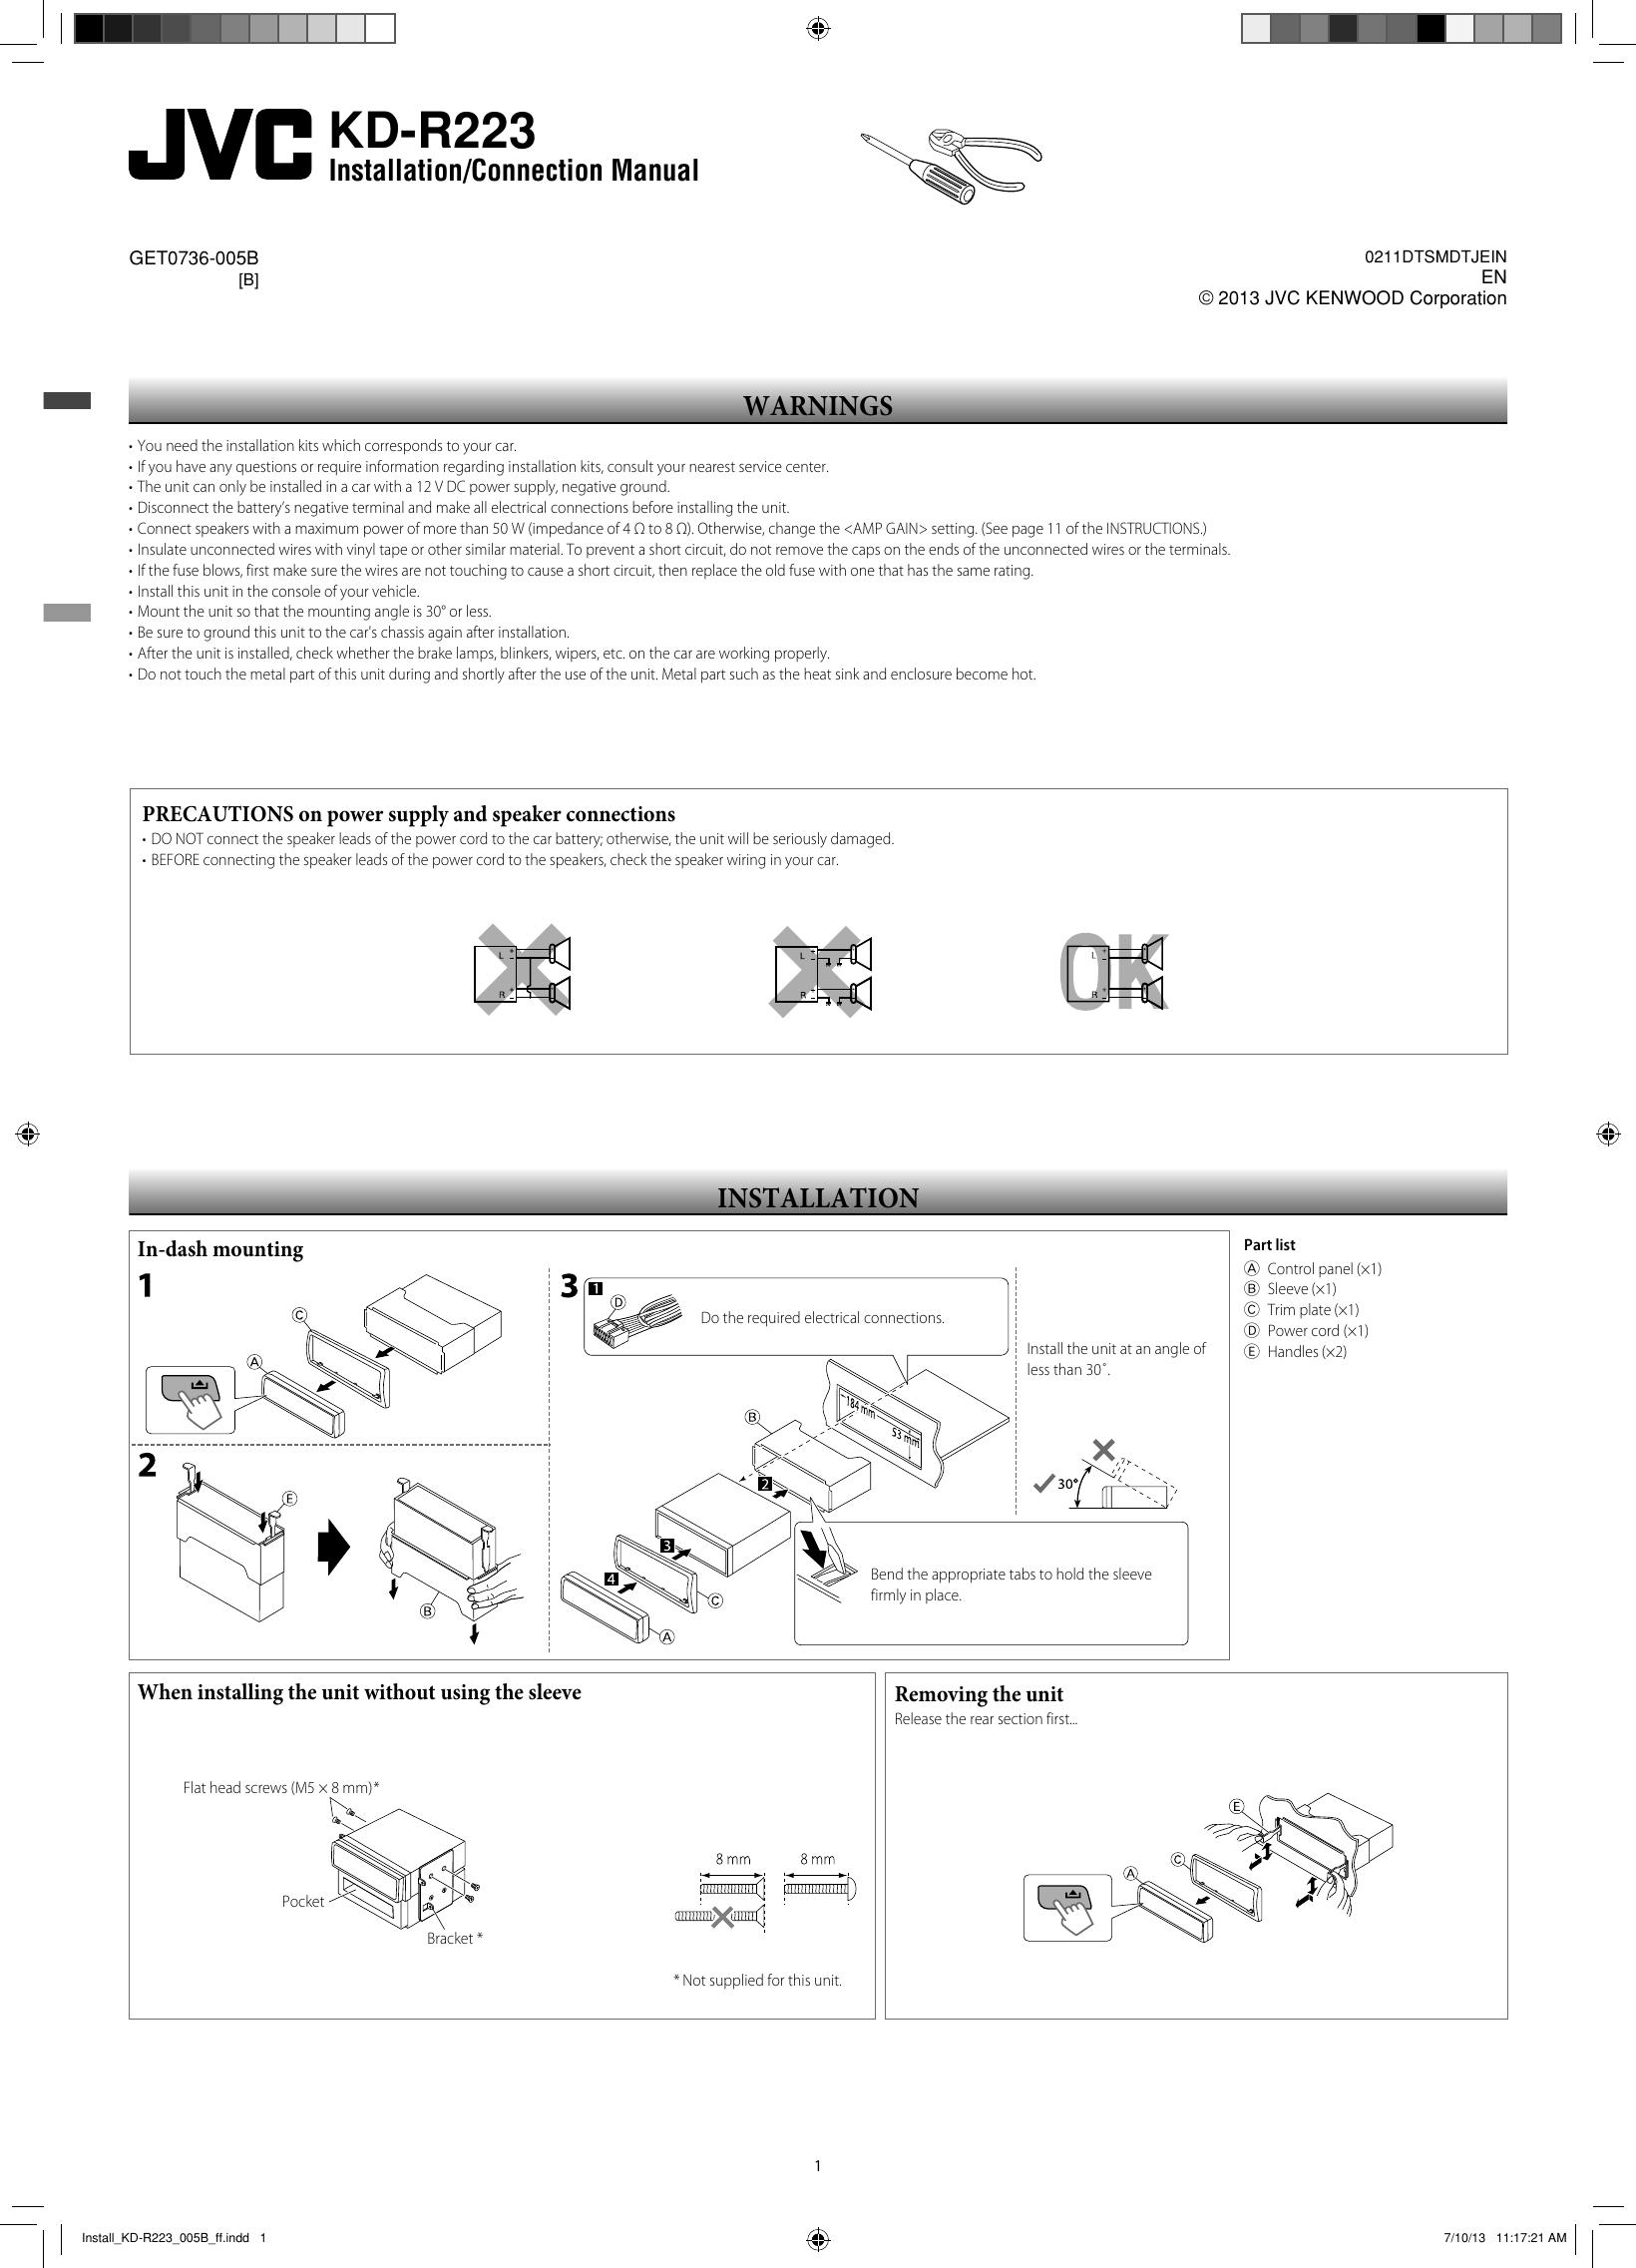 Jvc Miswiring Check Wiring Reset Trusted Diagrams Kw Av60bt Diagram Kd R223b Install R223 005b Ff User Manual Get0736 R330